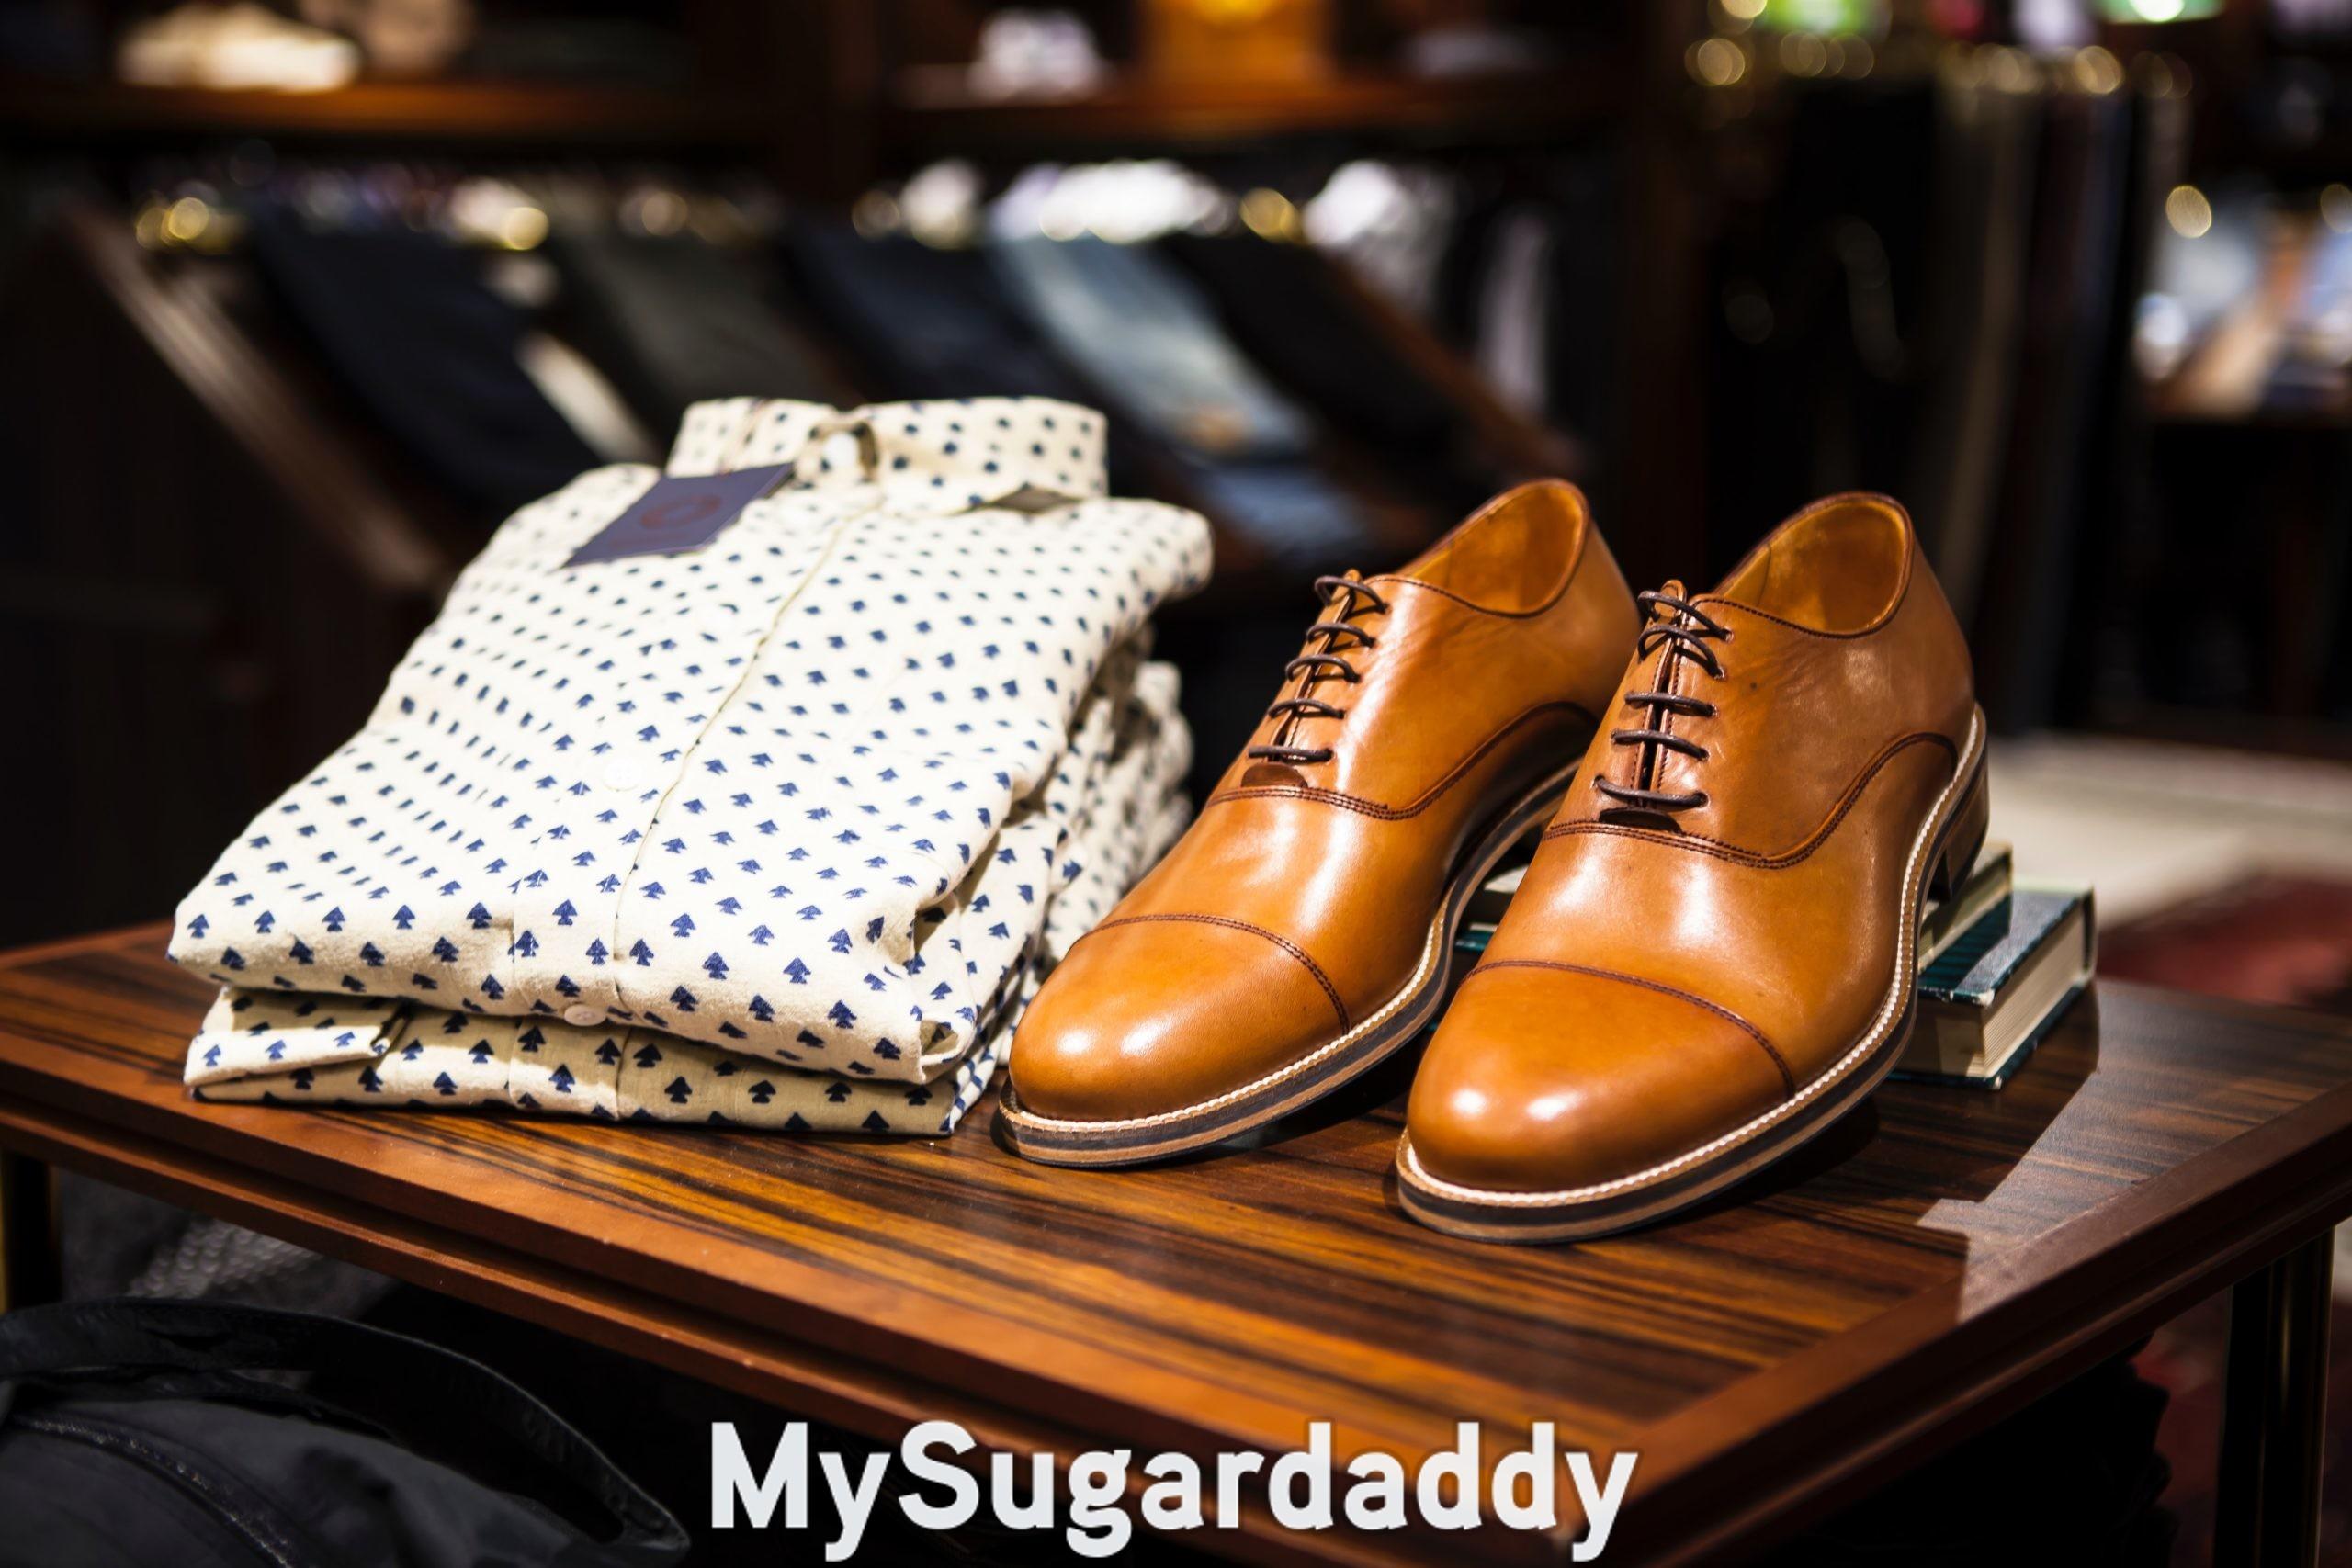 classic-clothes-commerce-fashion-298863